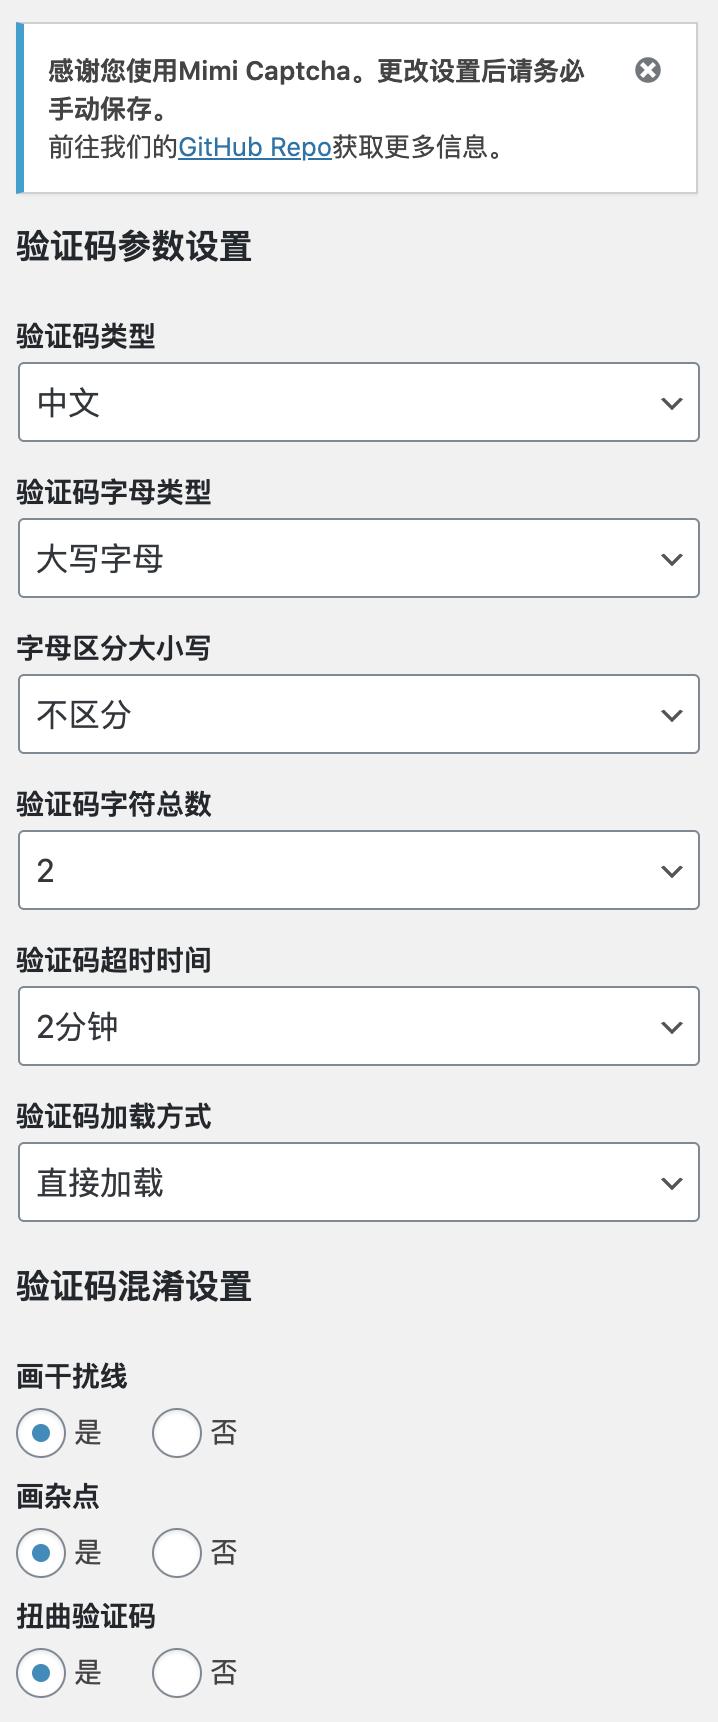 Mimi Captcha settings page